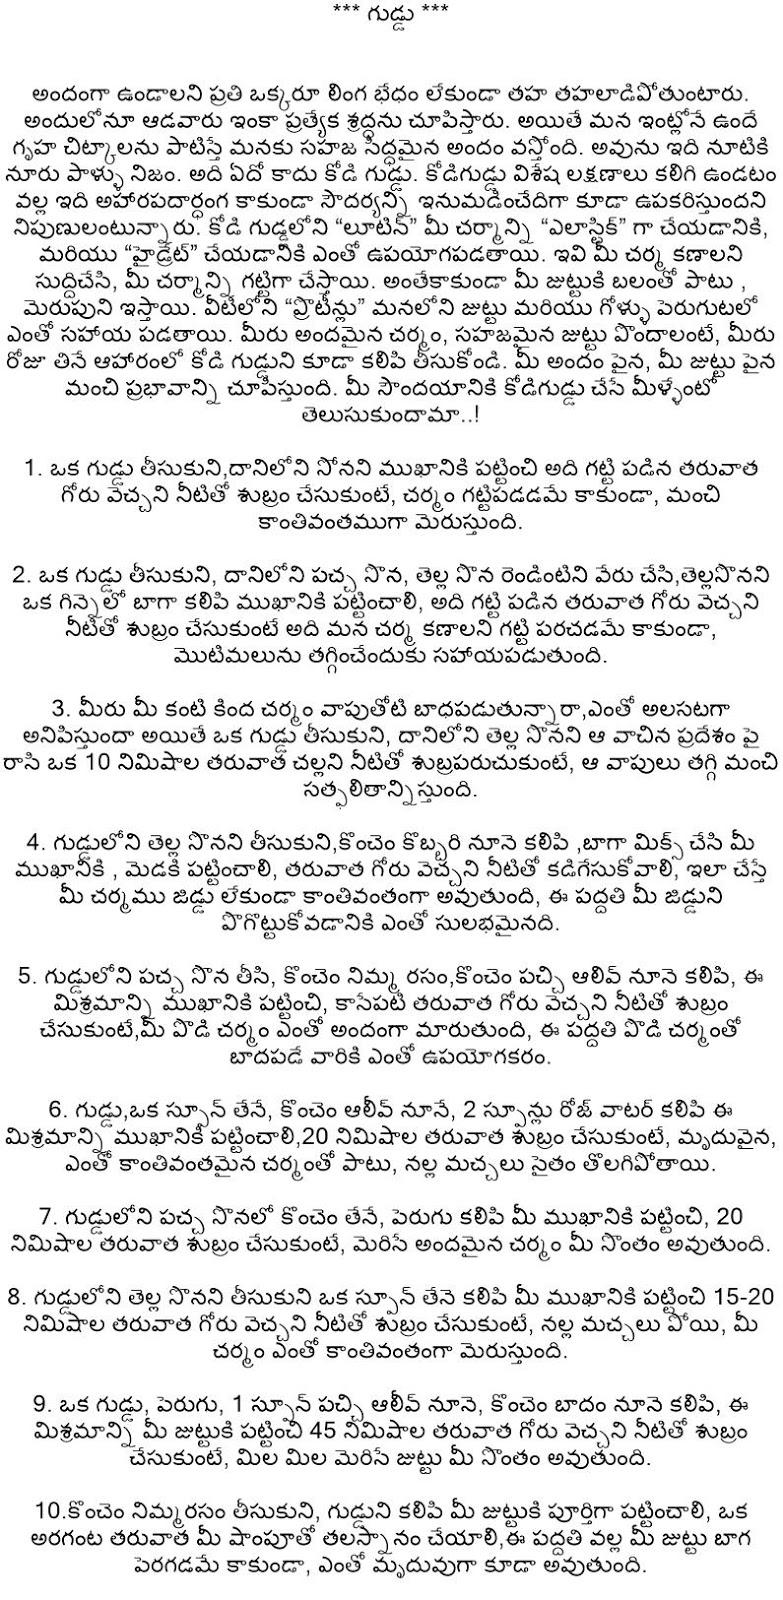 Telugu health care beauty benefits with egg for the beauty and telugu health channel egg telugu health tips caretelugu health tips pdf egg telugu health tips caretelugu health quotes egg telugu health tips caretelugu forumfinder Choice Image